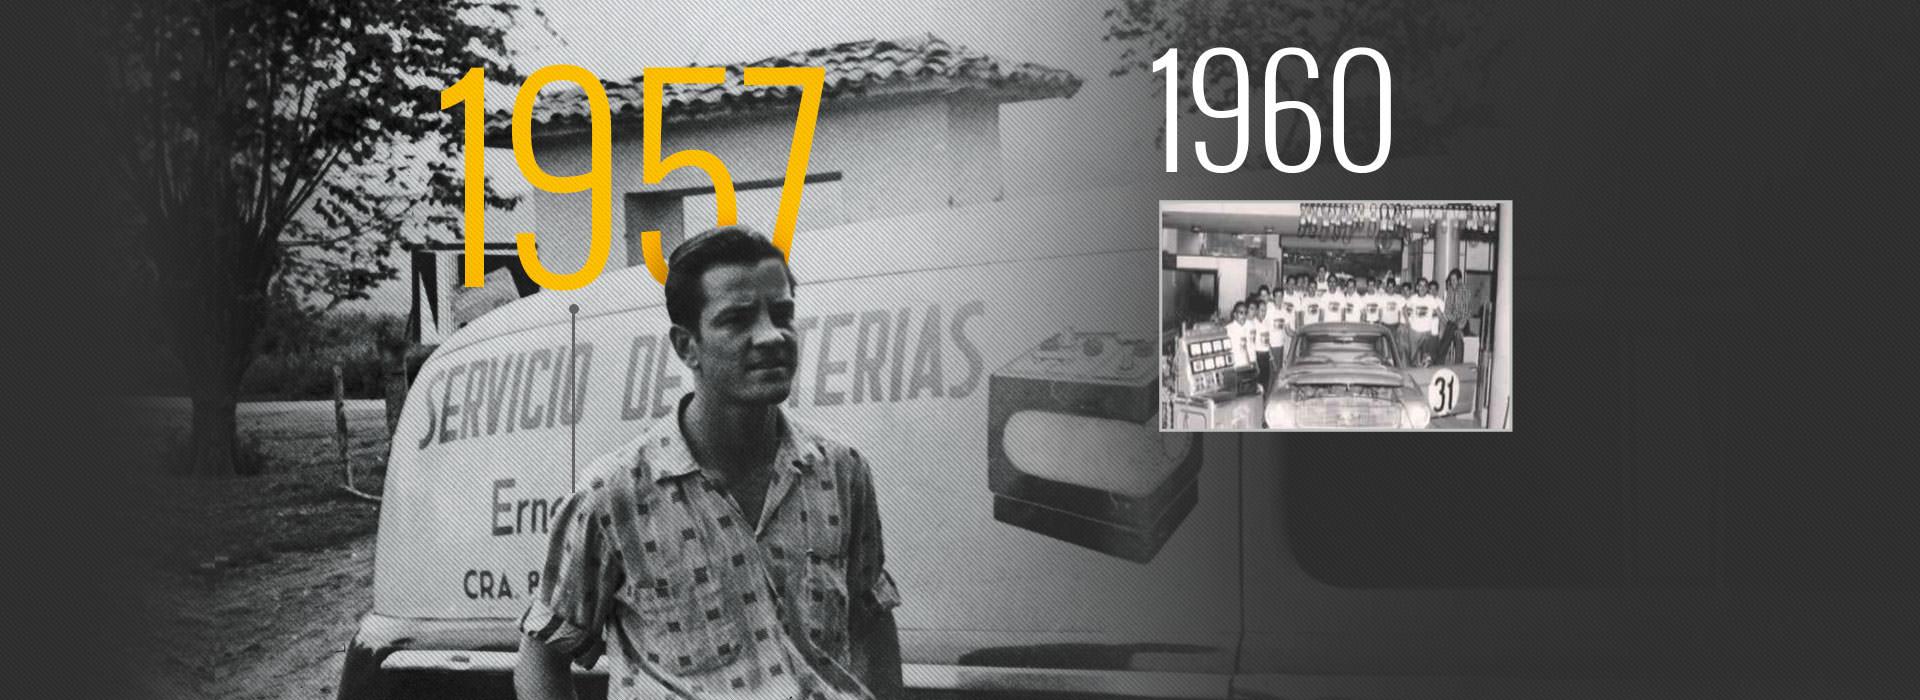 MAC_History_1957-1960.jpg